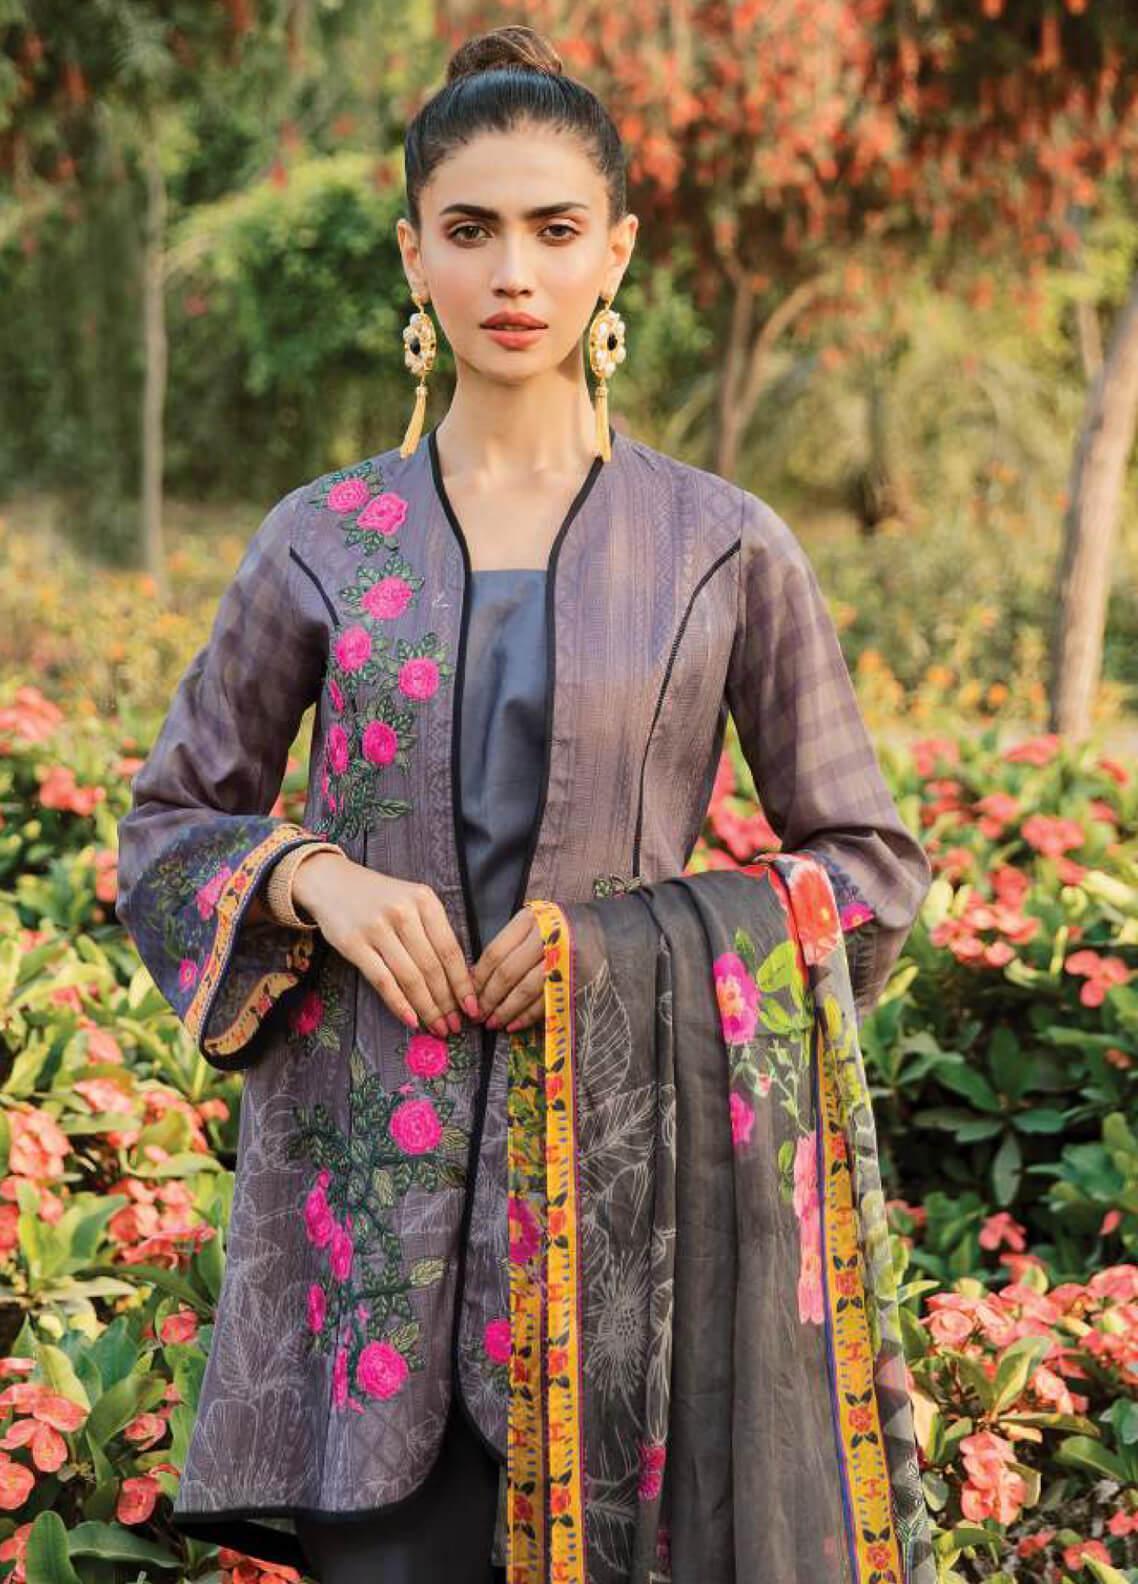 Serene Premium Embroidered Lawn Unstitched 3 Piece Suit SPM19L 06 DEWDROP LAVENDER - Spring / Summer Collection